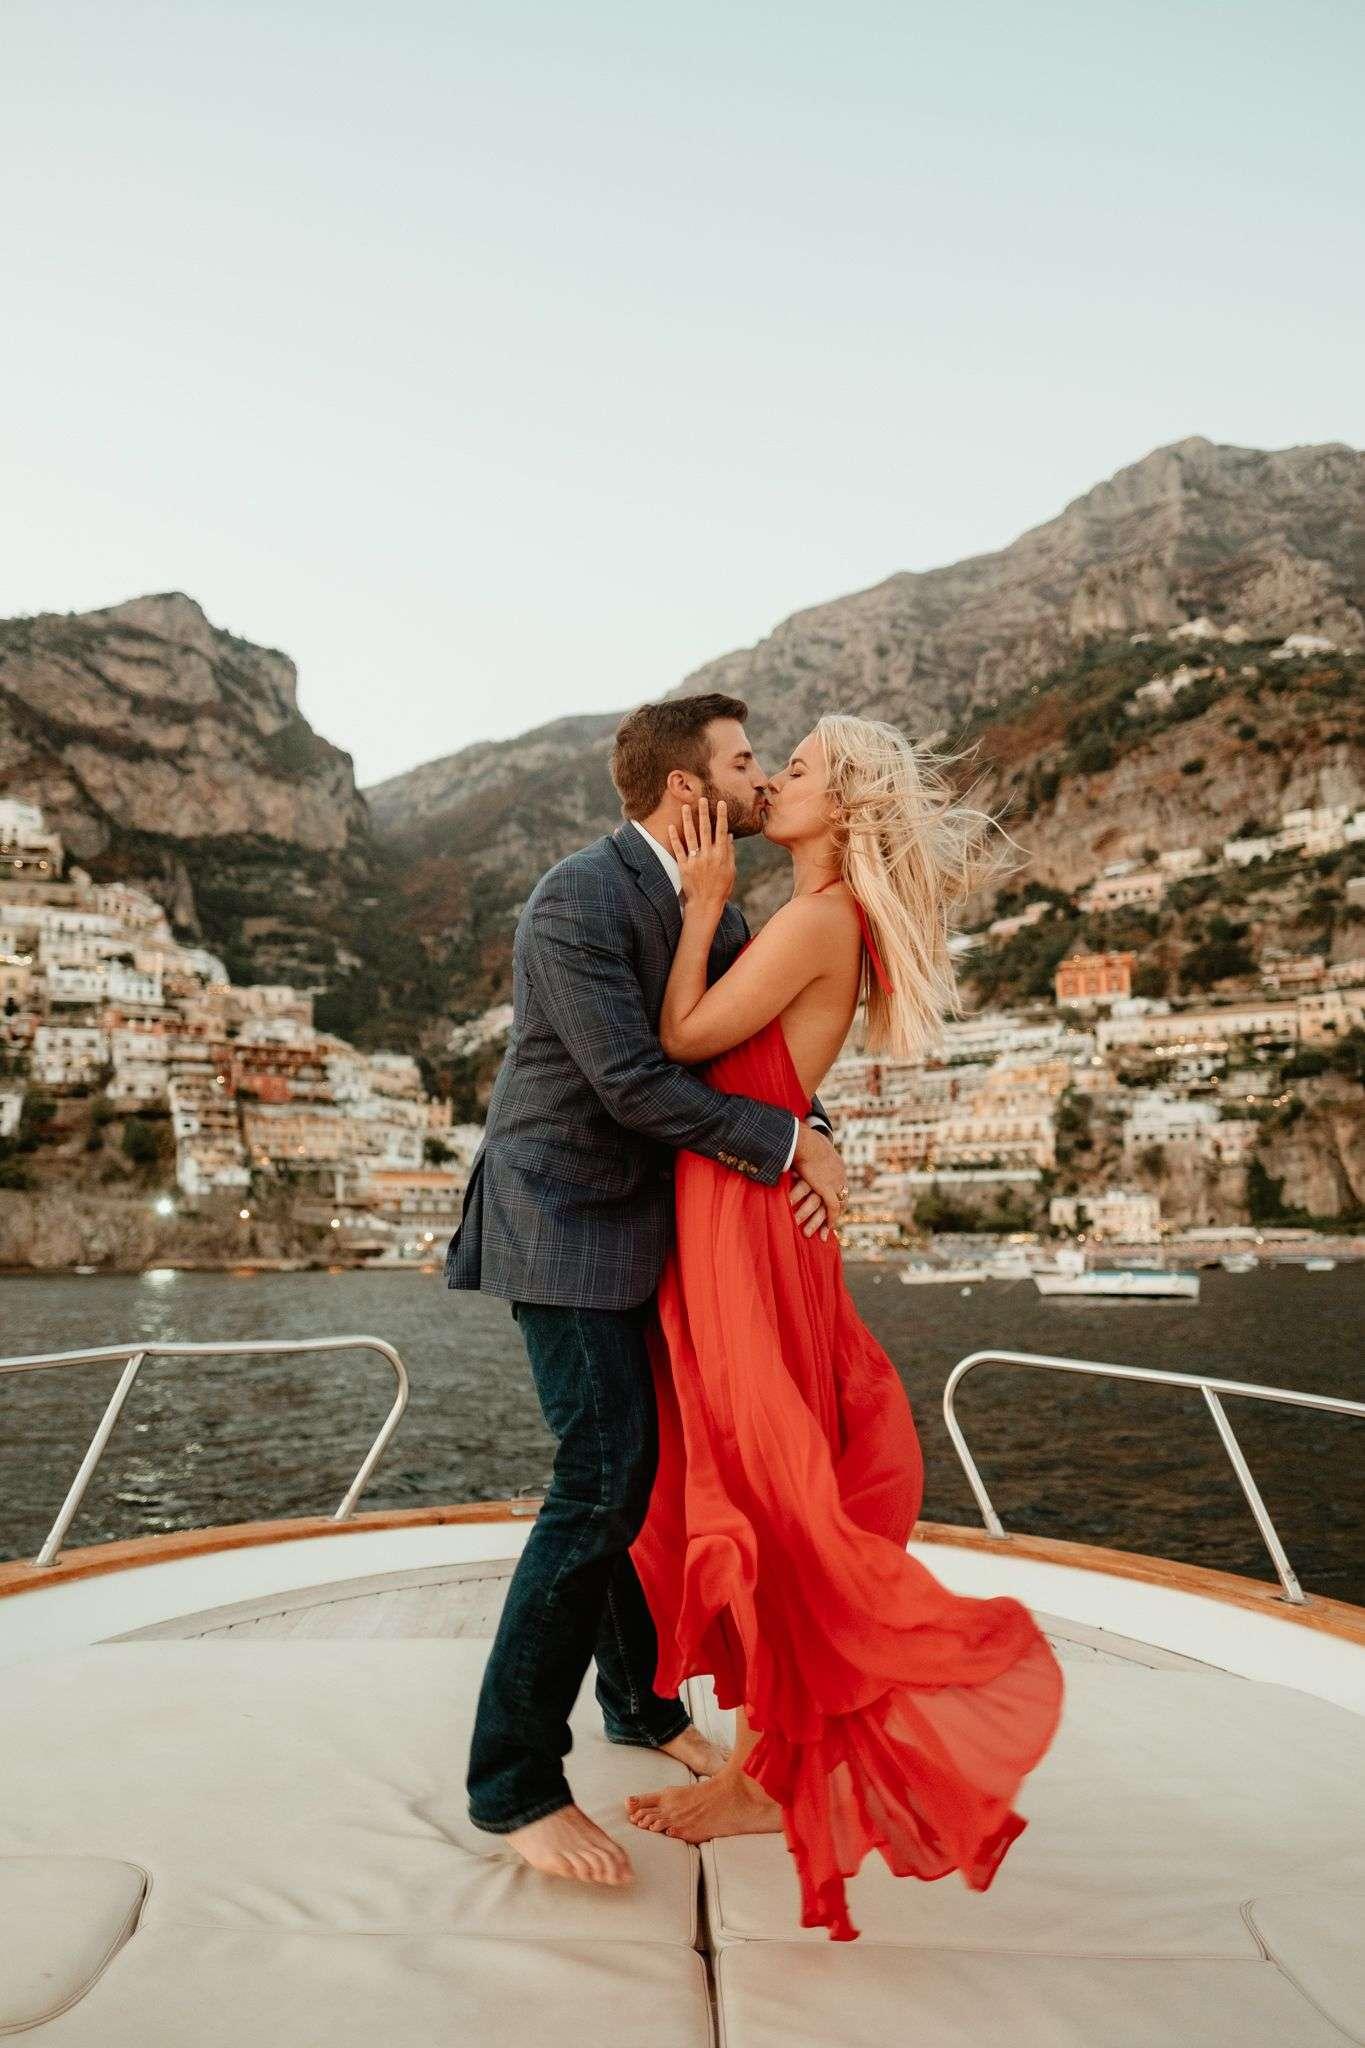 Wedding proposal in Positano